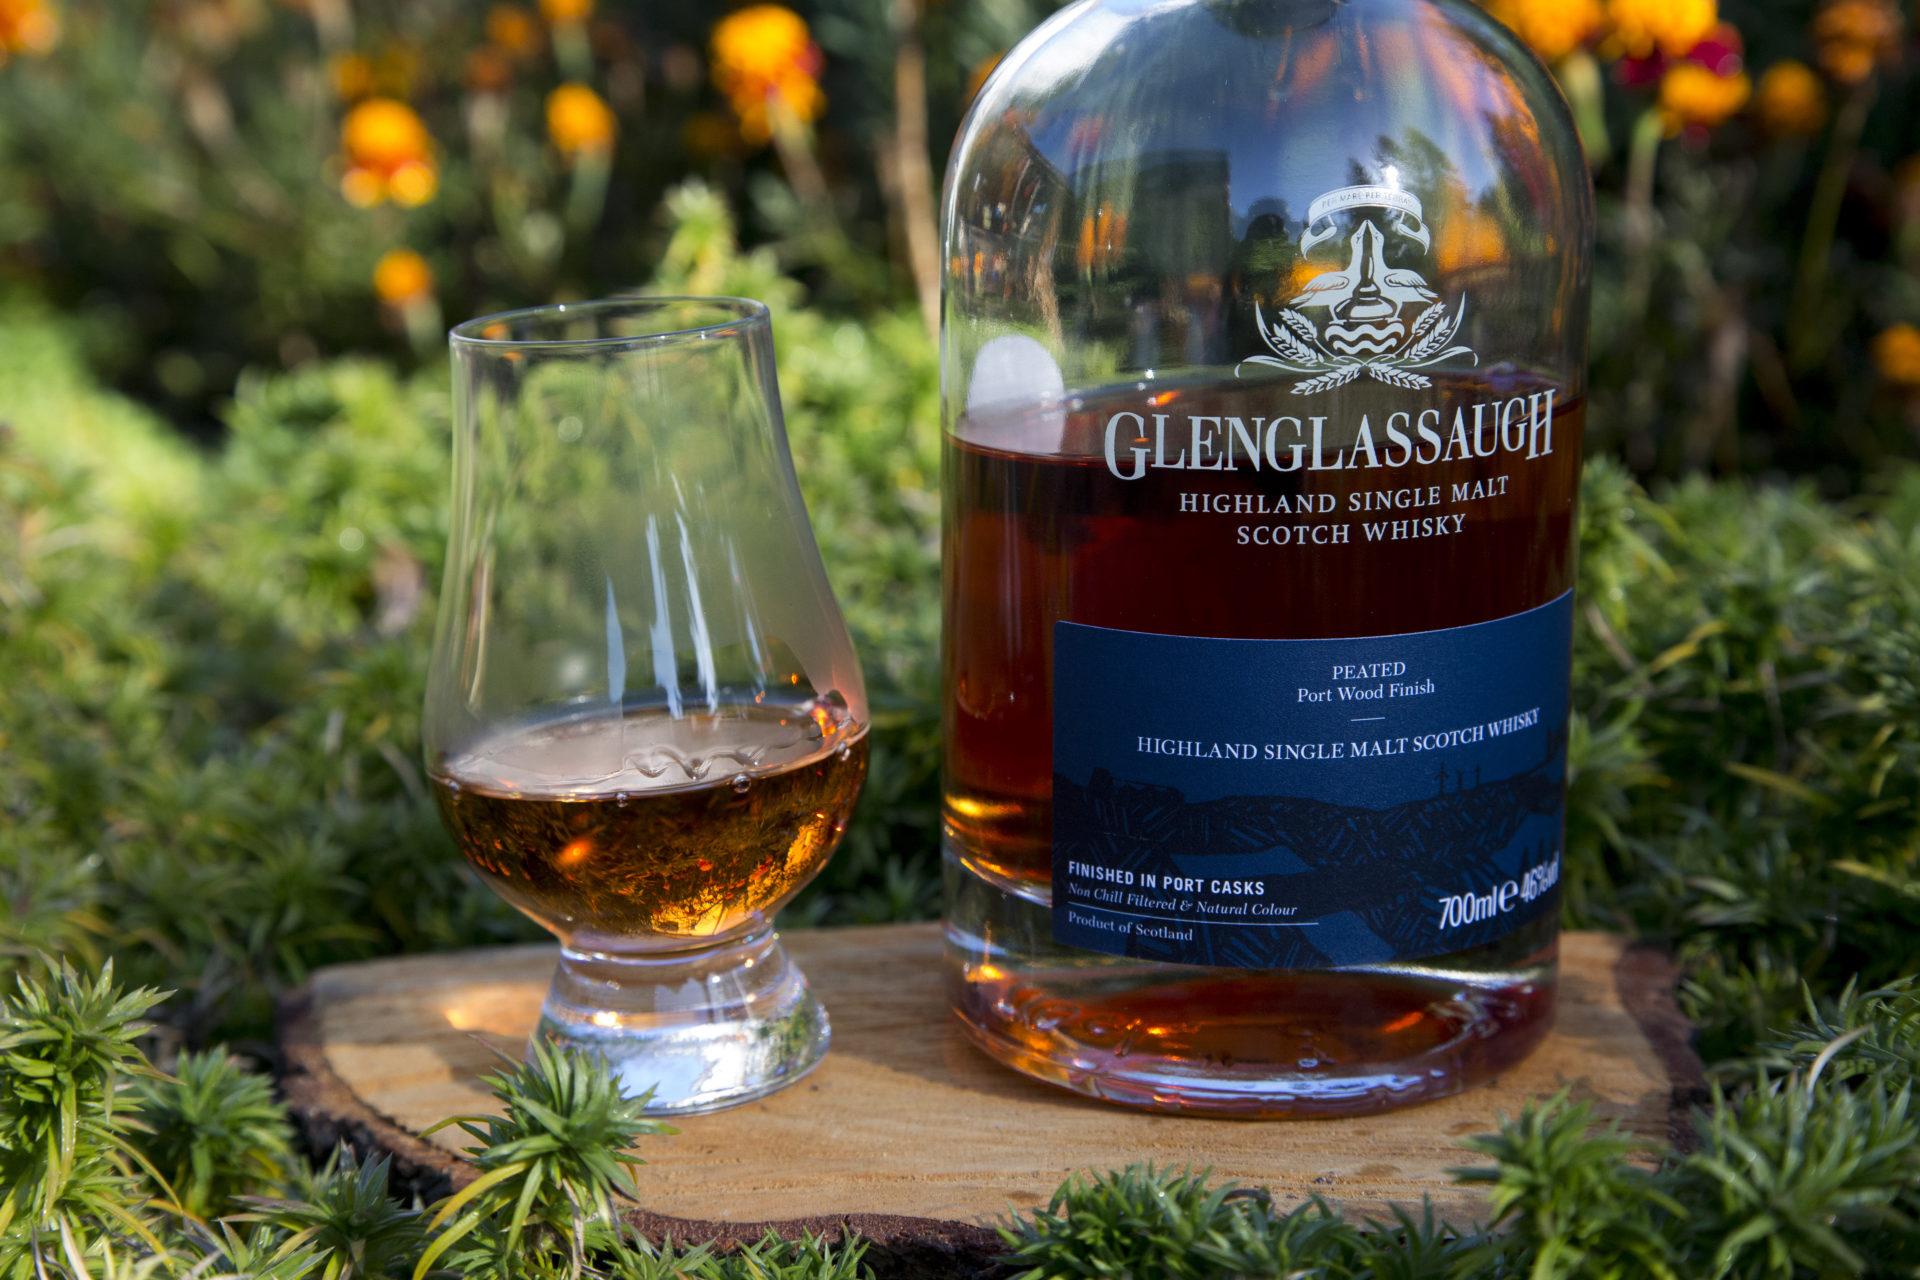 Nasza recenzja Glenglassaugh Peated Port Wood Finish #5